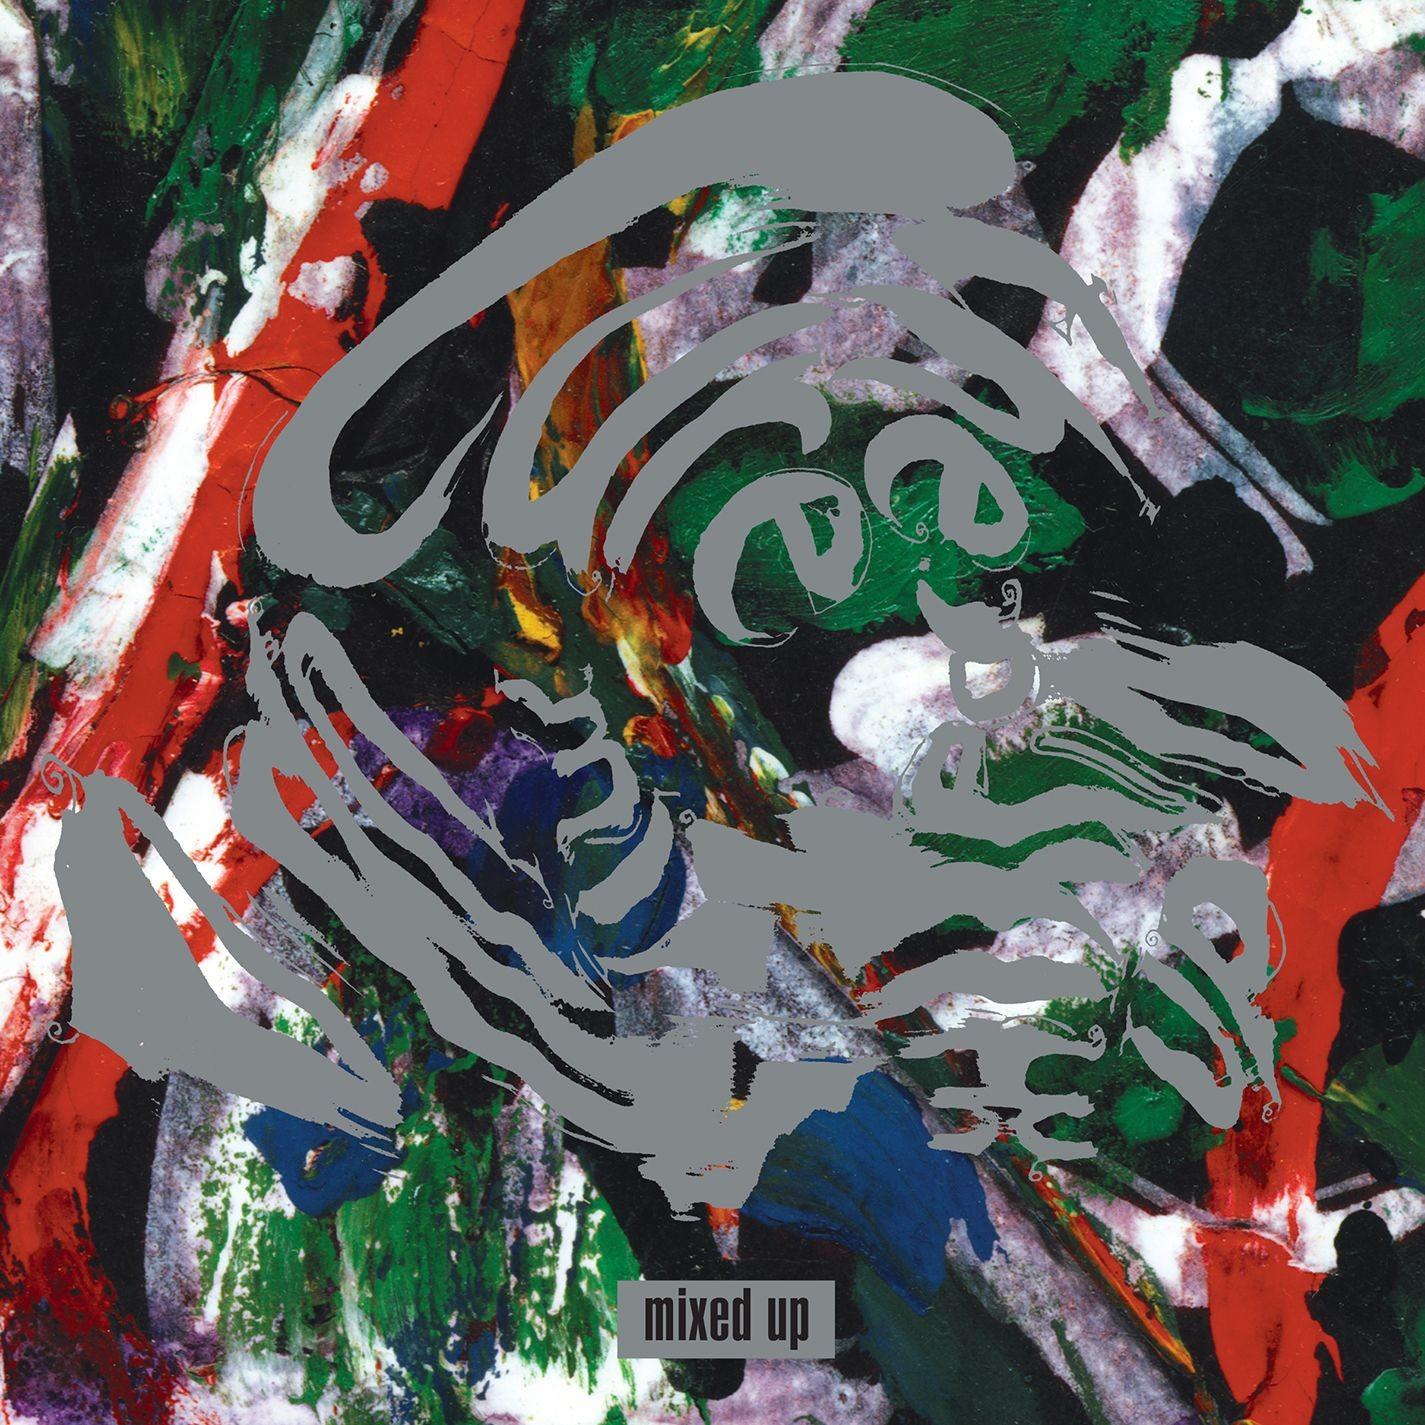 The Cure - Mixed Up 2XLP Vinyl